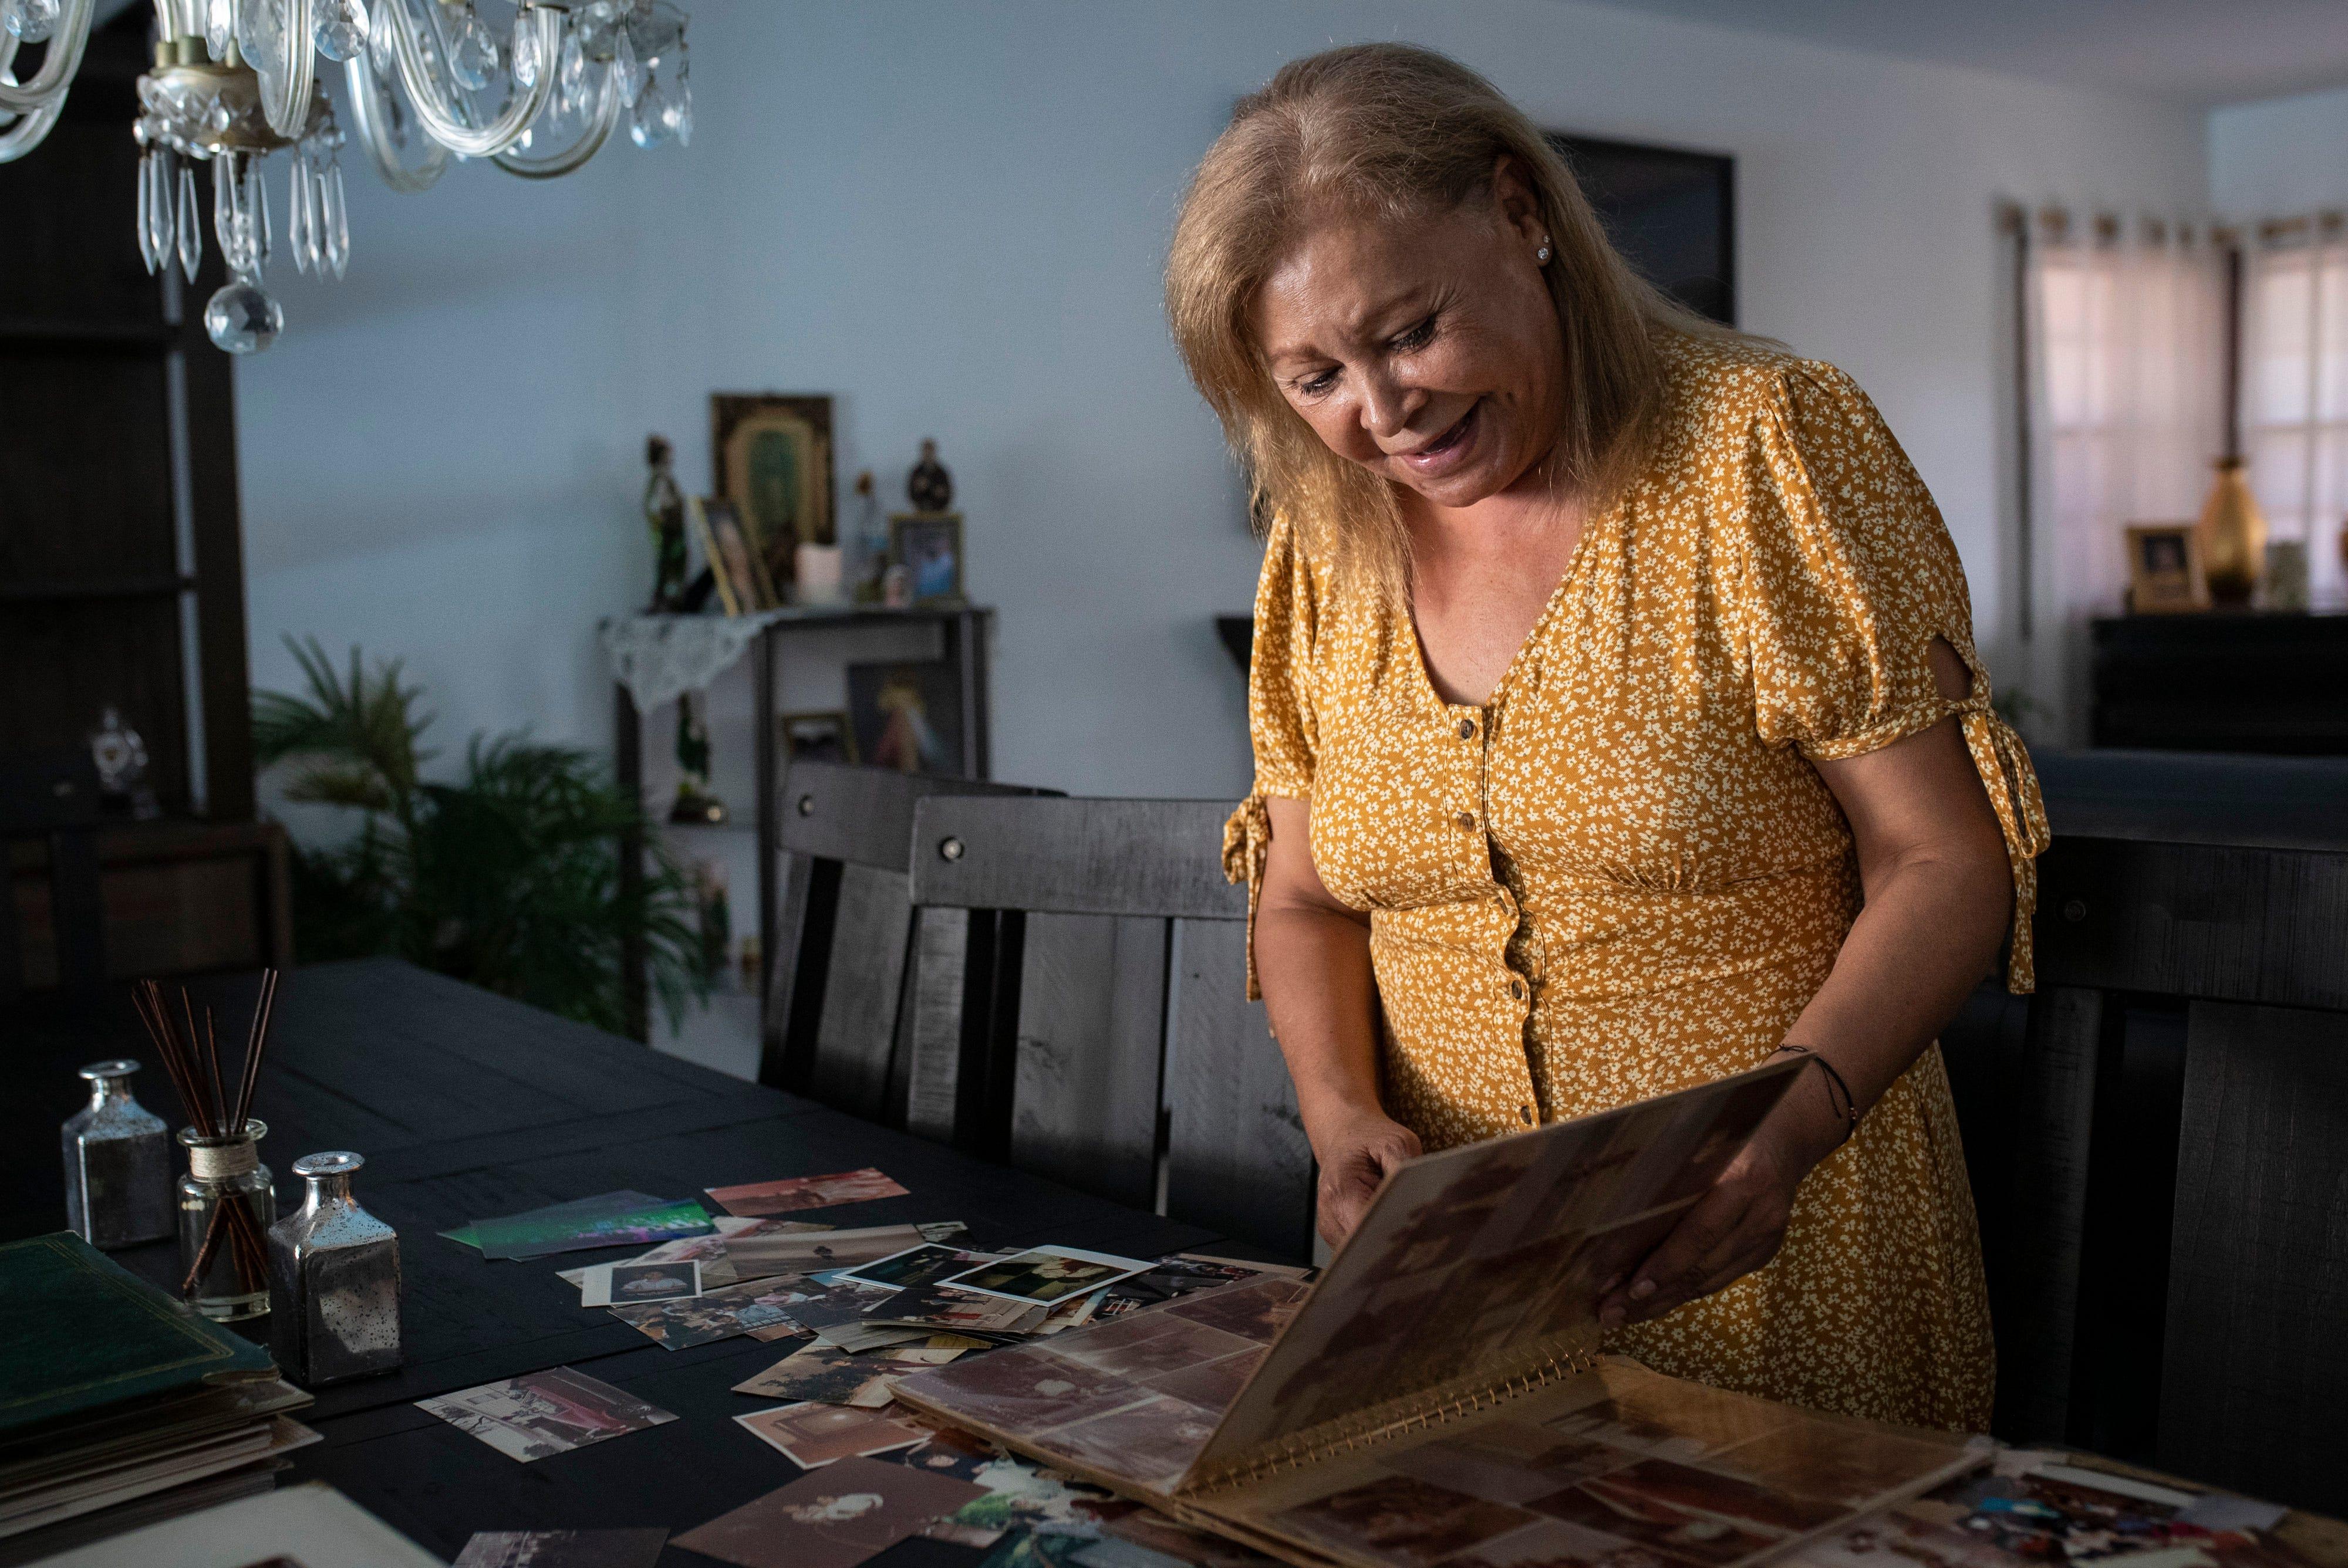 Carmen Macias, 62, looks through family photographs of her son Oscar Macias, who disappeared in 2014.